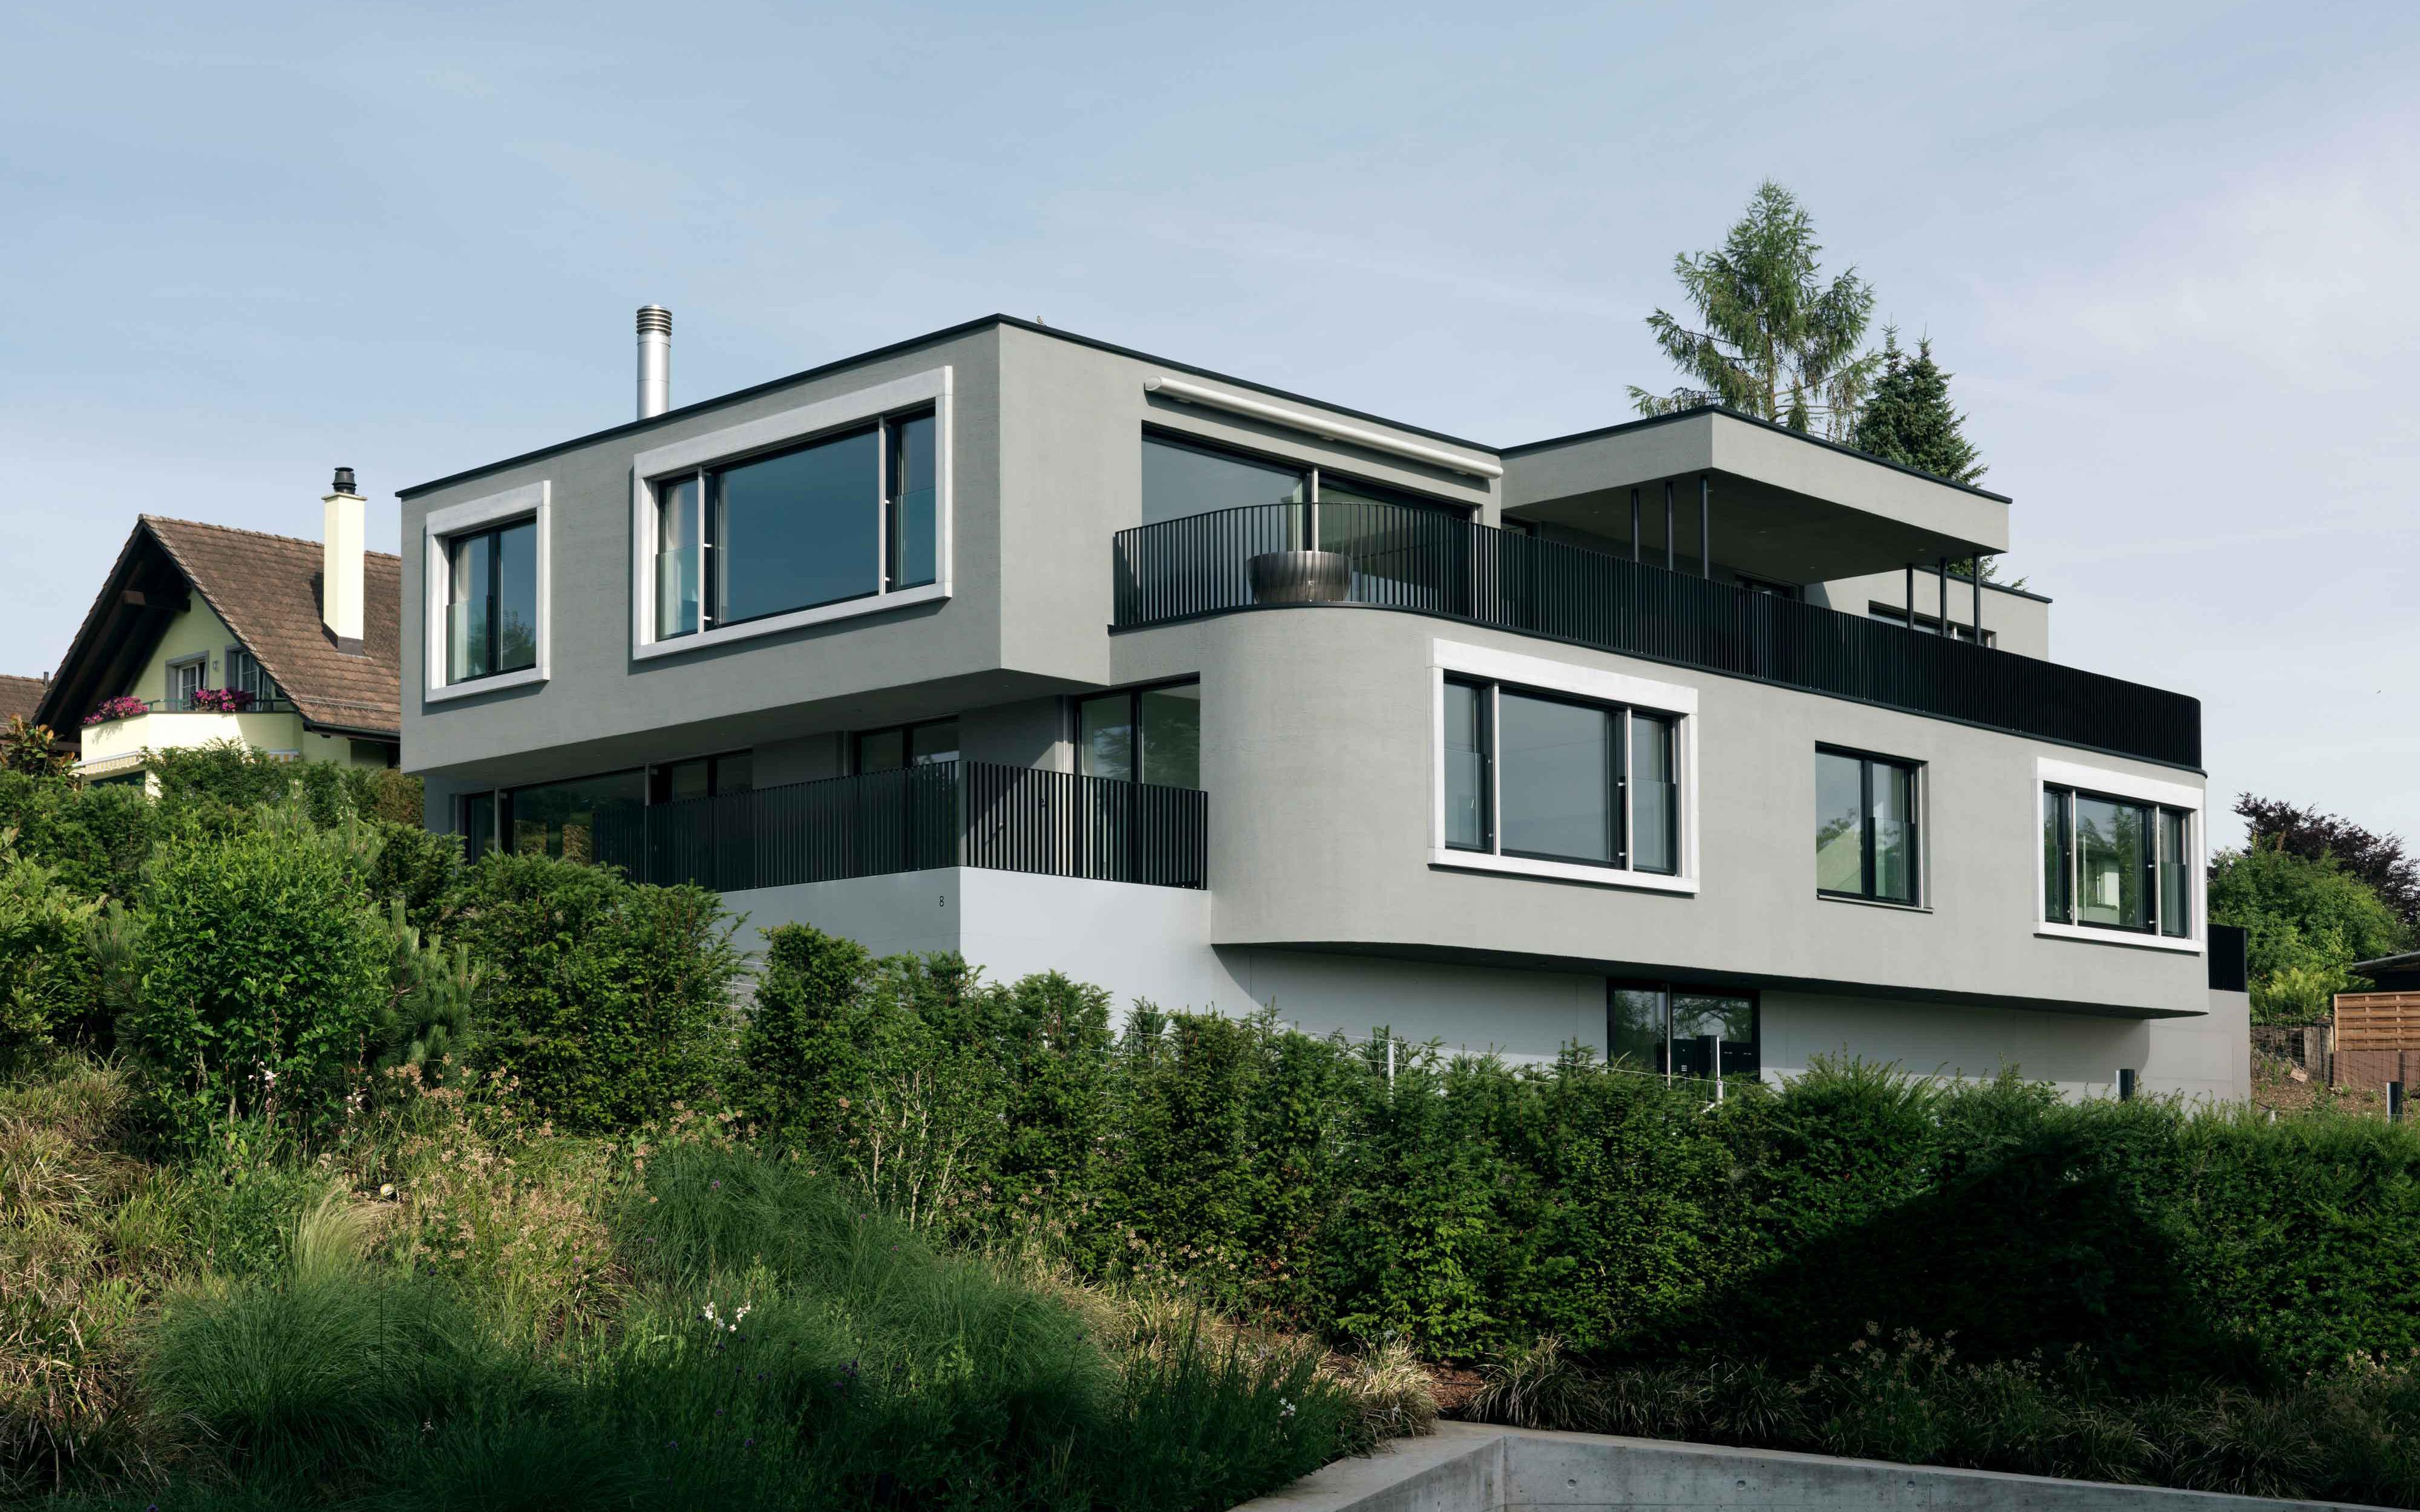 projekte m3 architekten. Black Bedroom Furniture Sets. Home Design Ideas